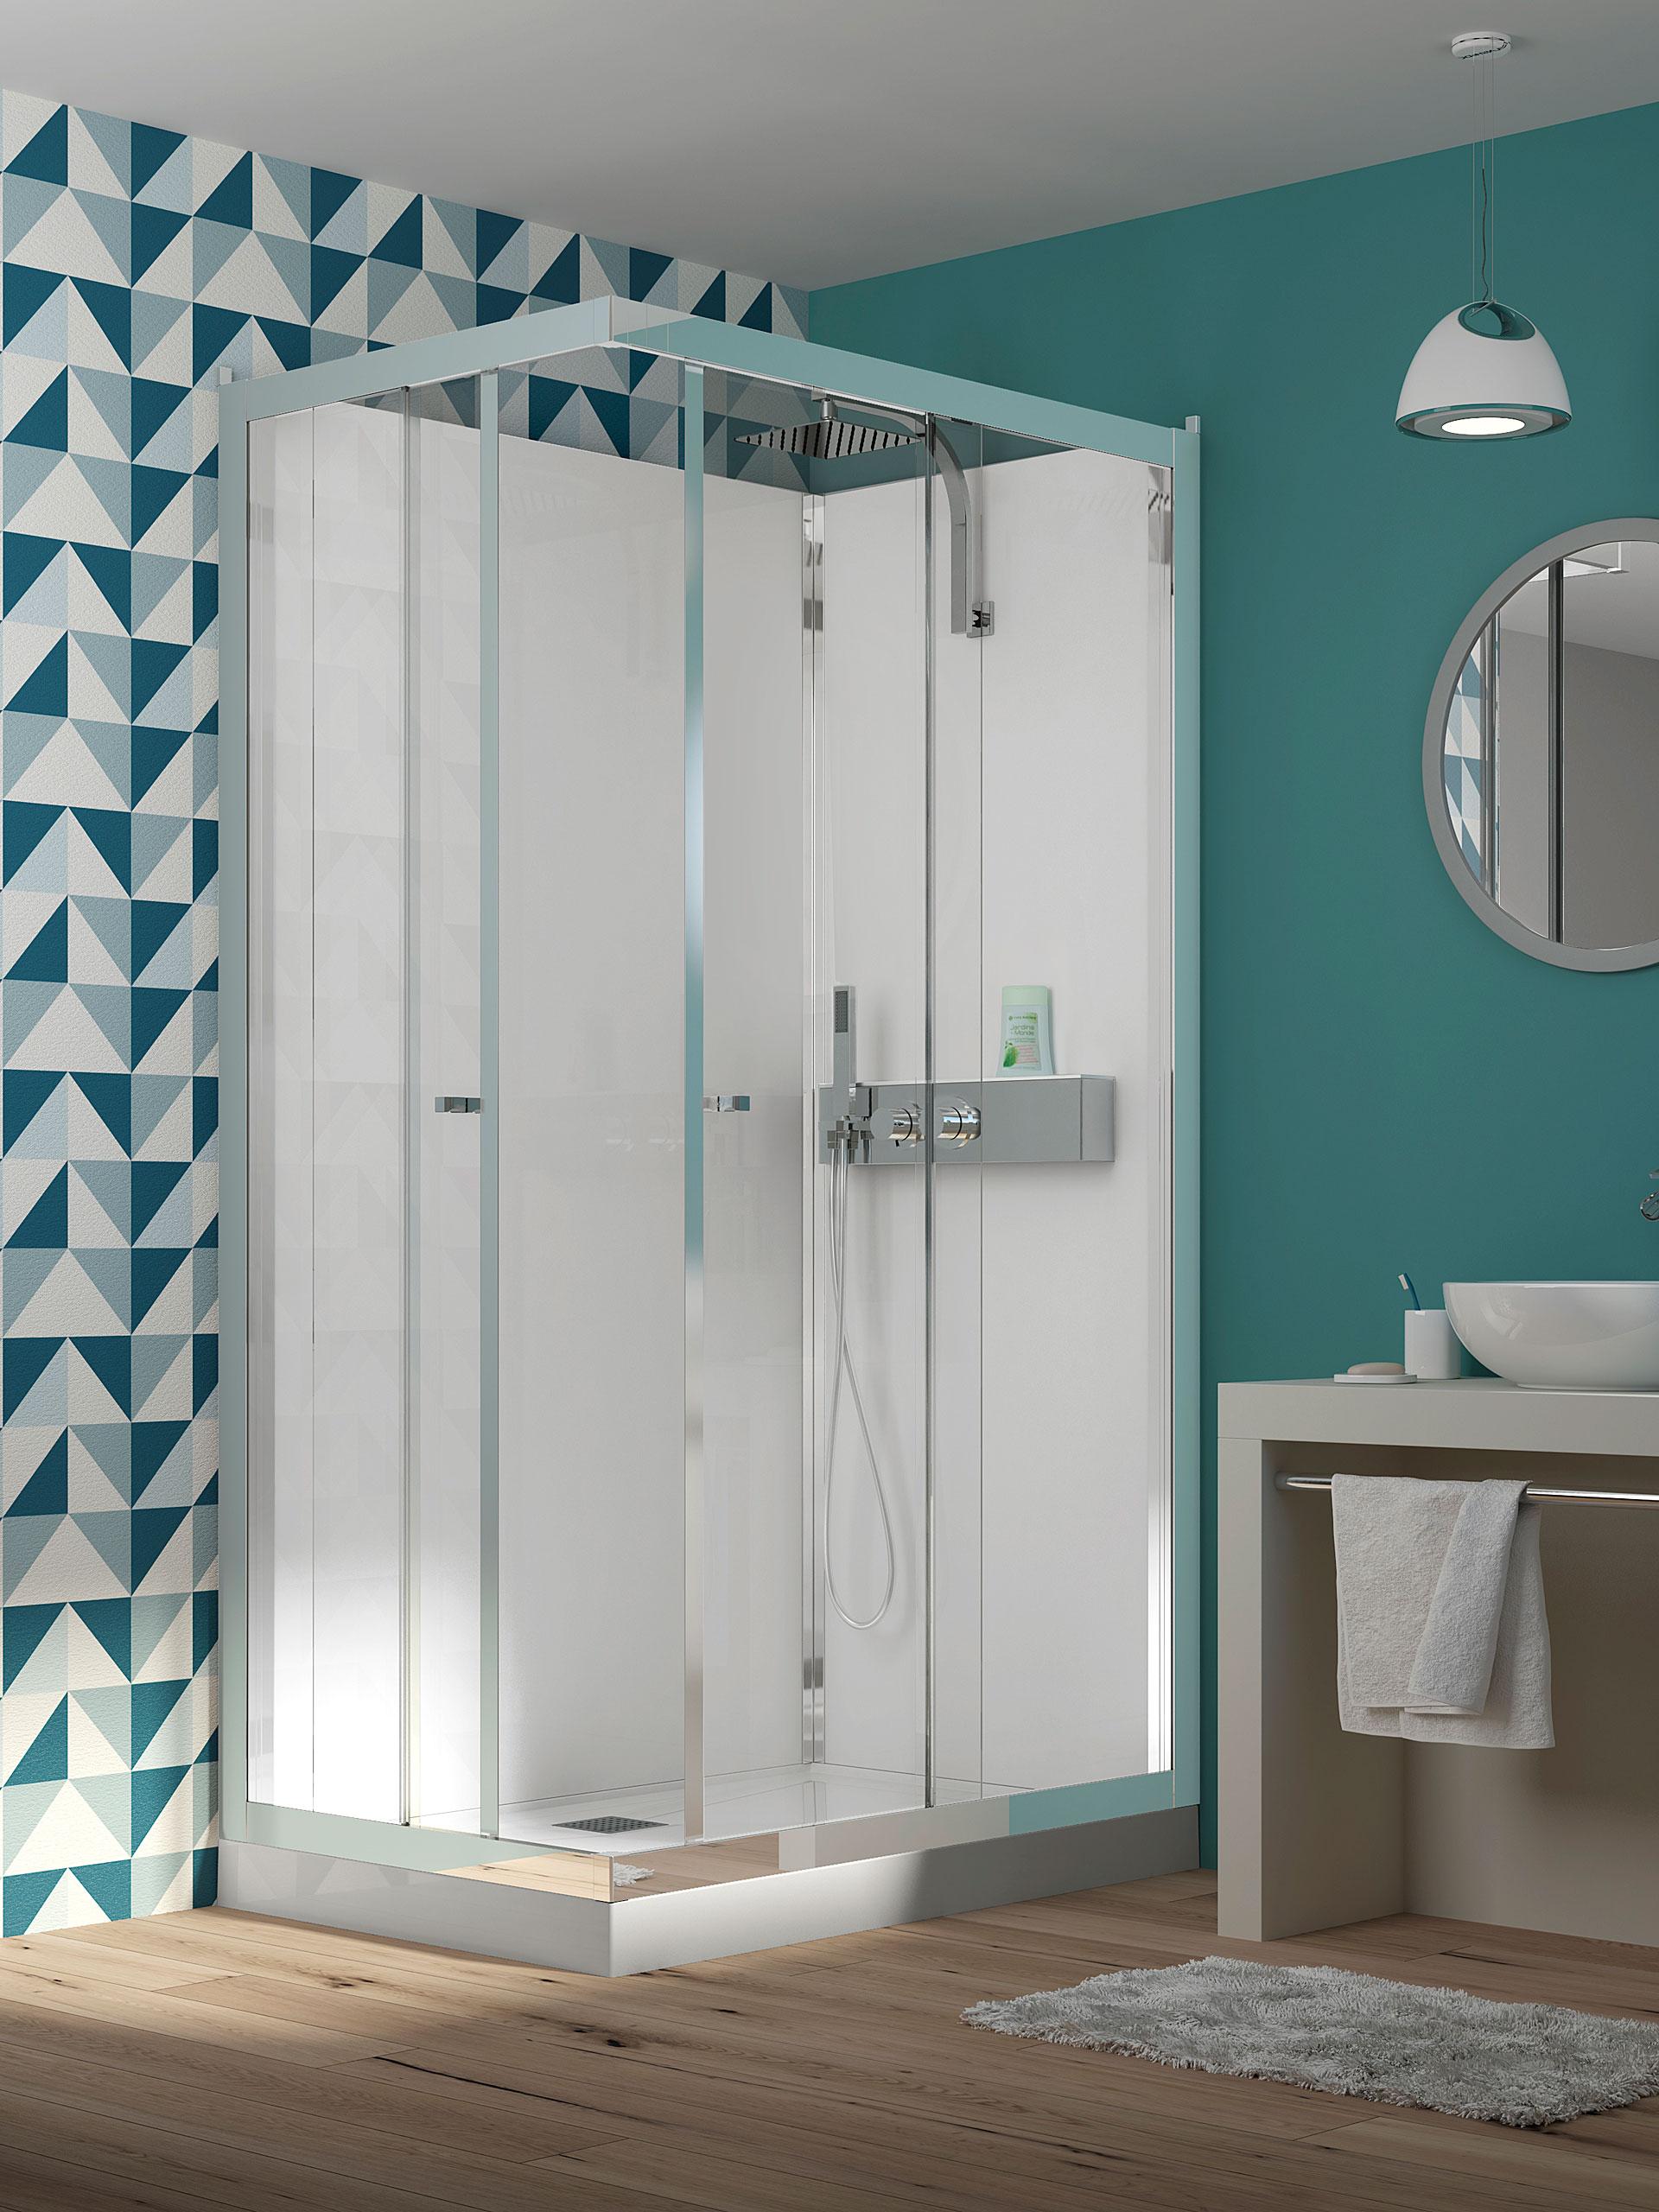 cabinas de ducha ikea